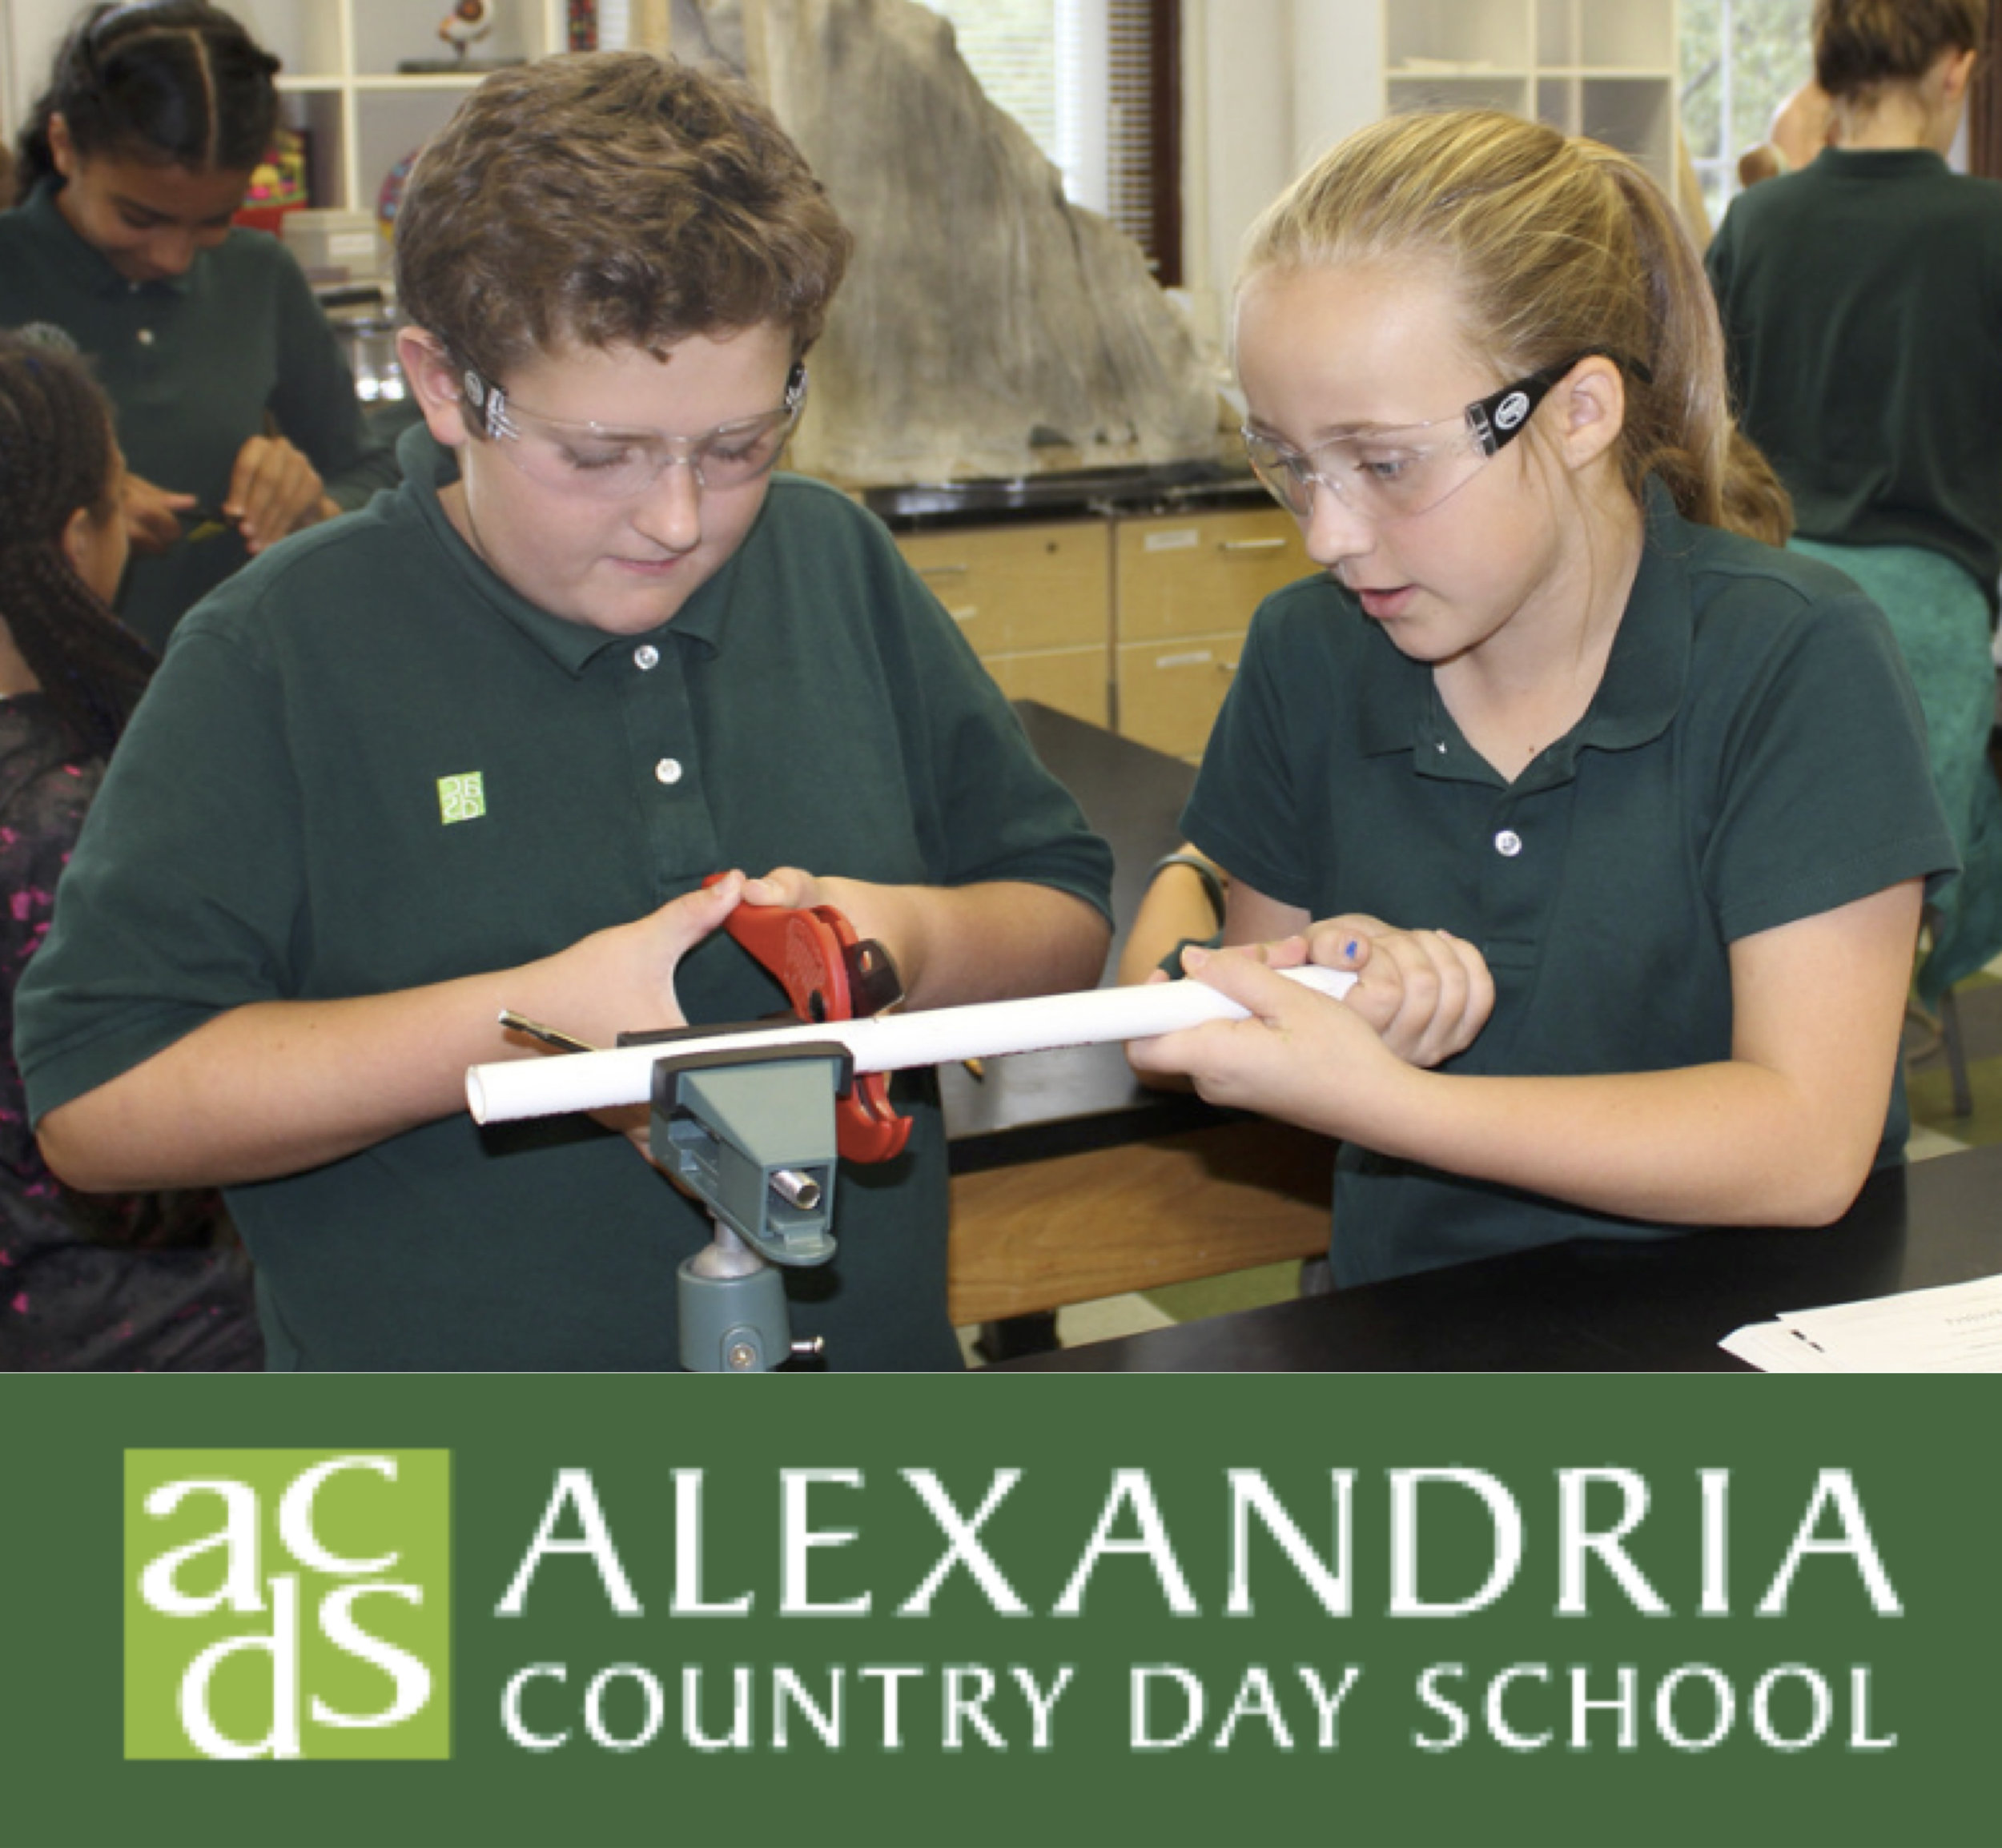 ALEXANDRIA COUNTRY DAY SCHOOL